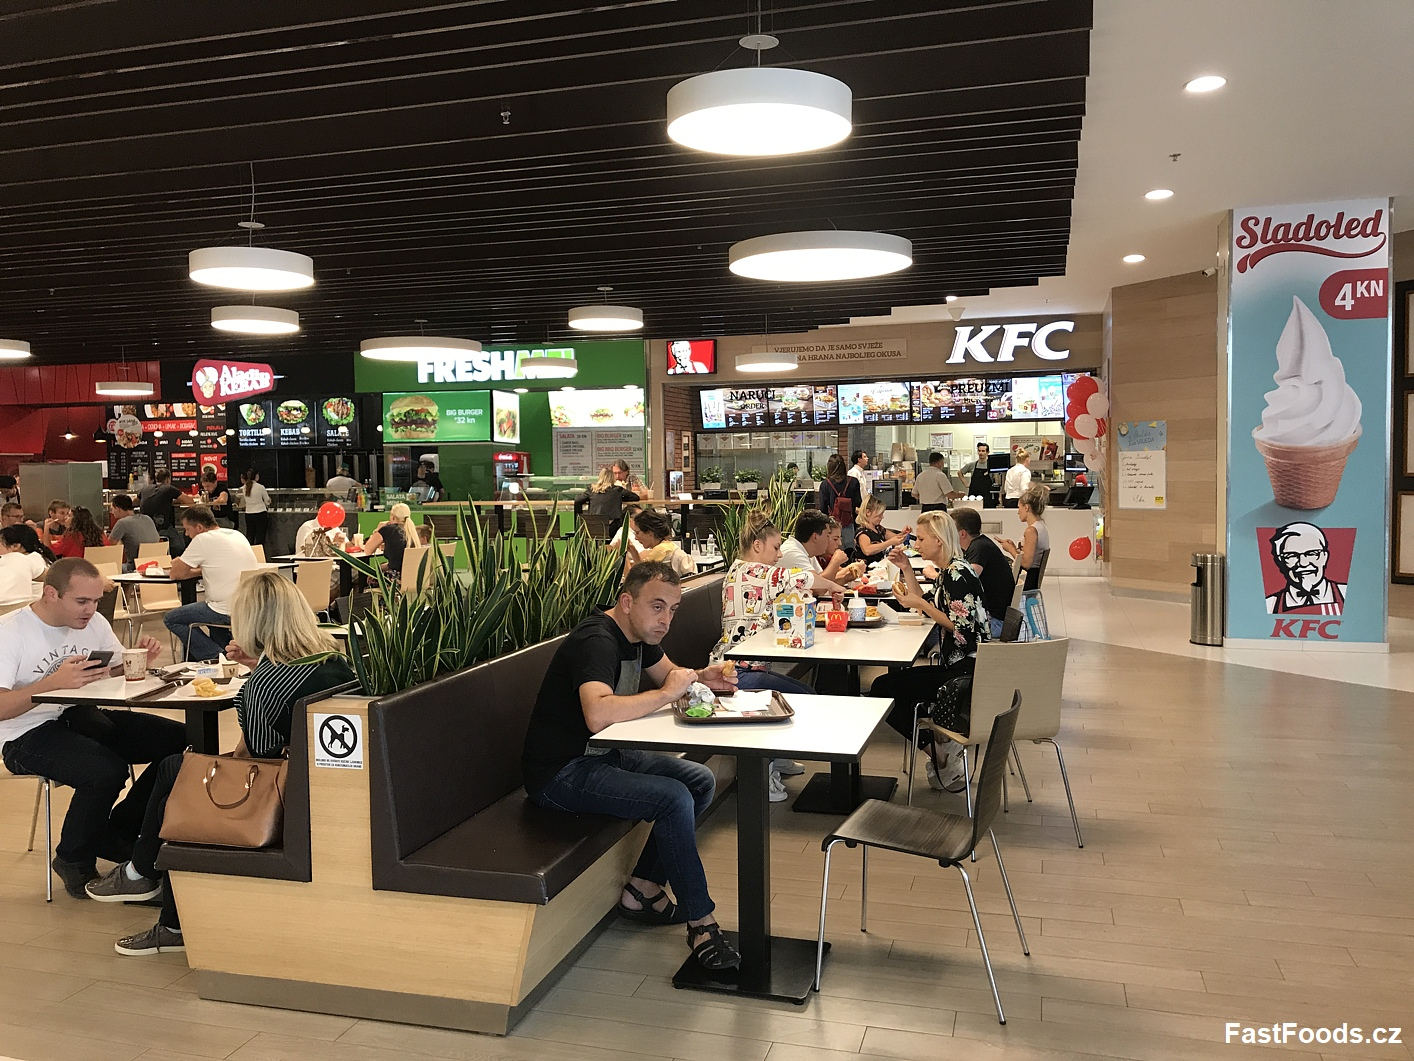 KFC City Center One West, Hrvatska, Chorvatsko, fastfoods.cz